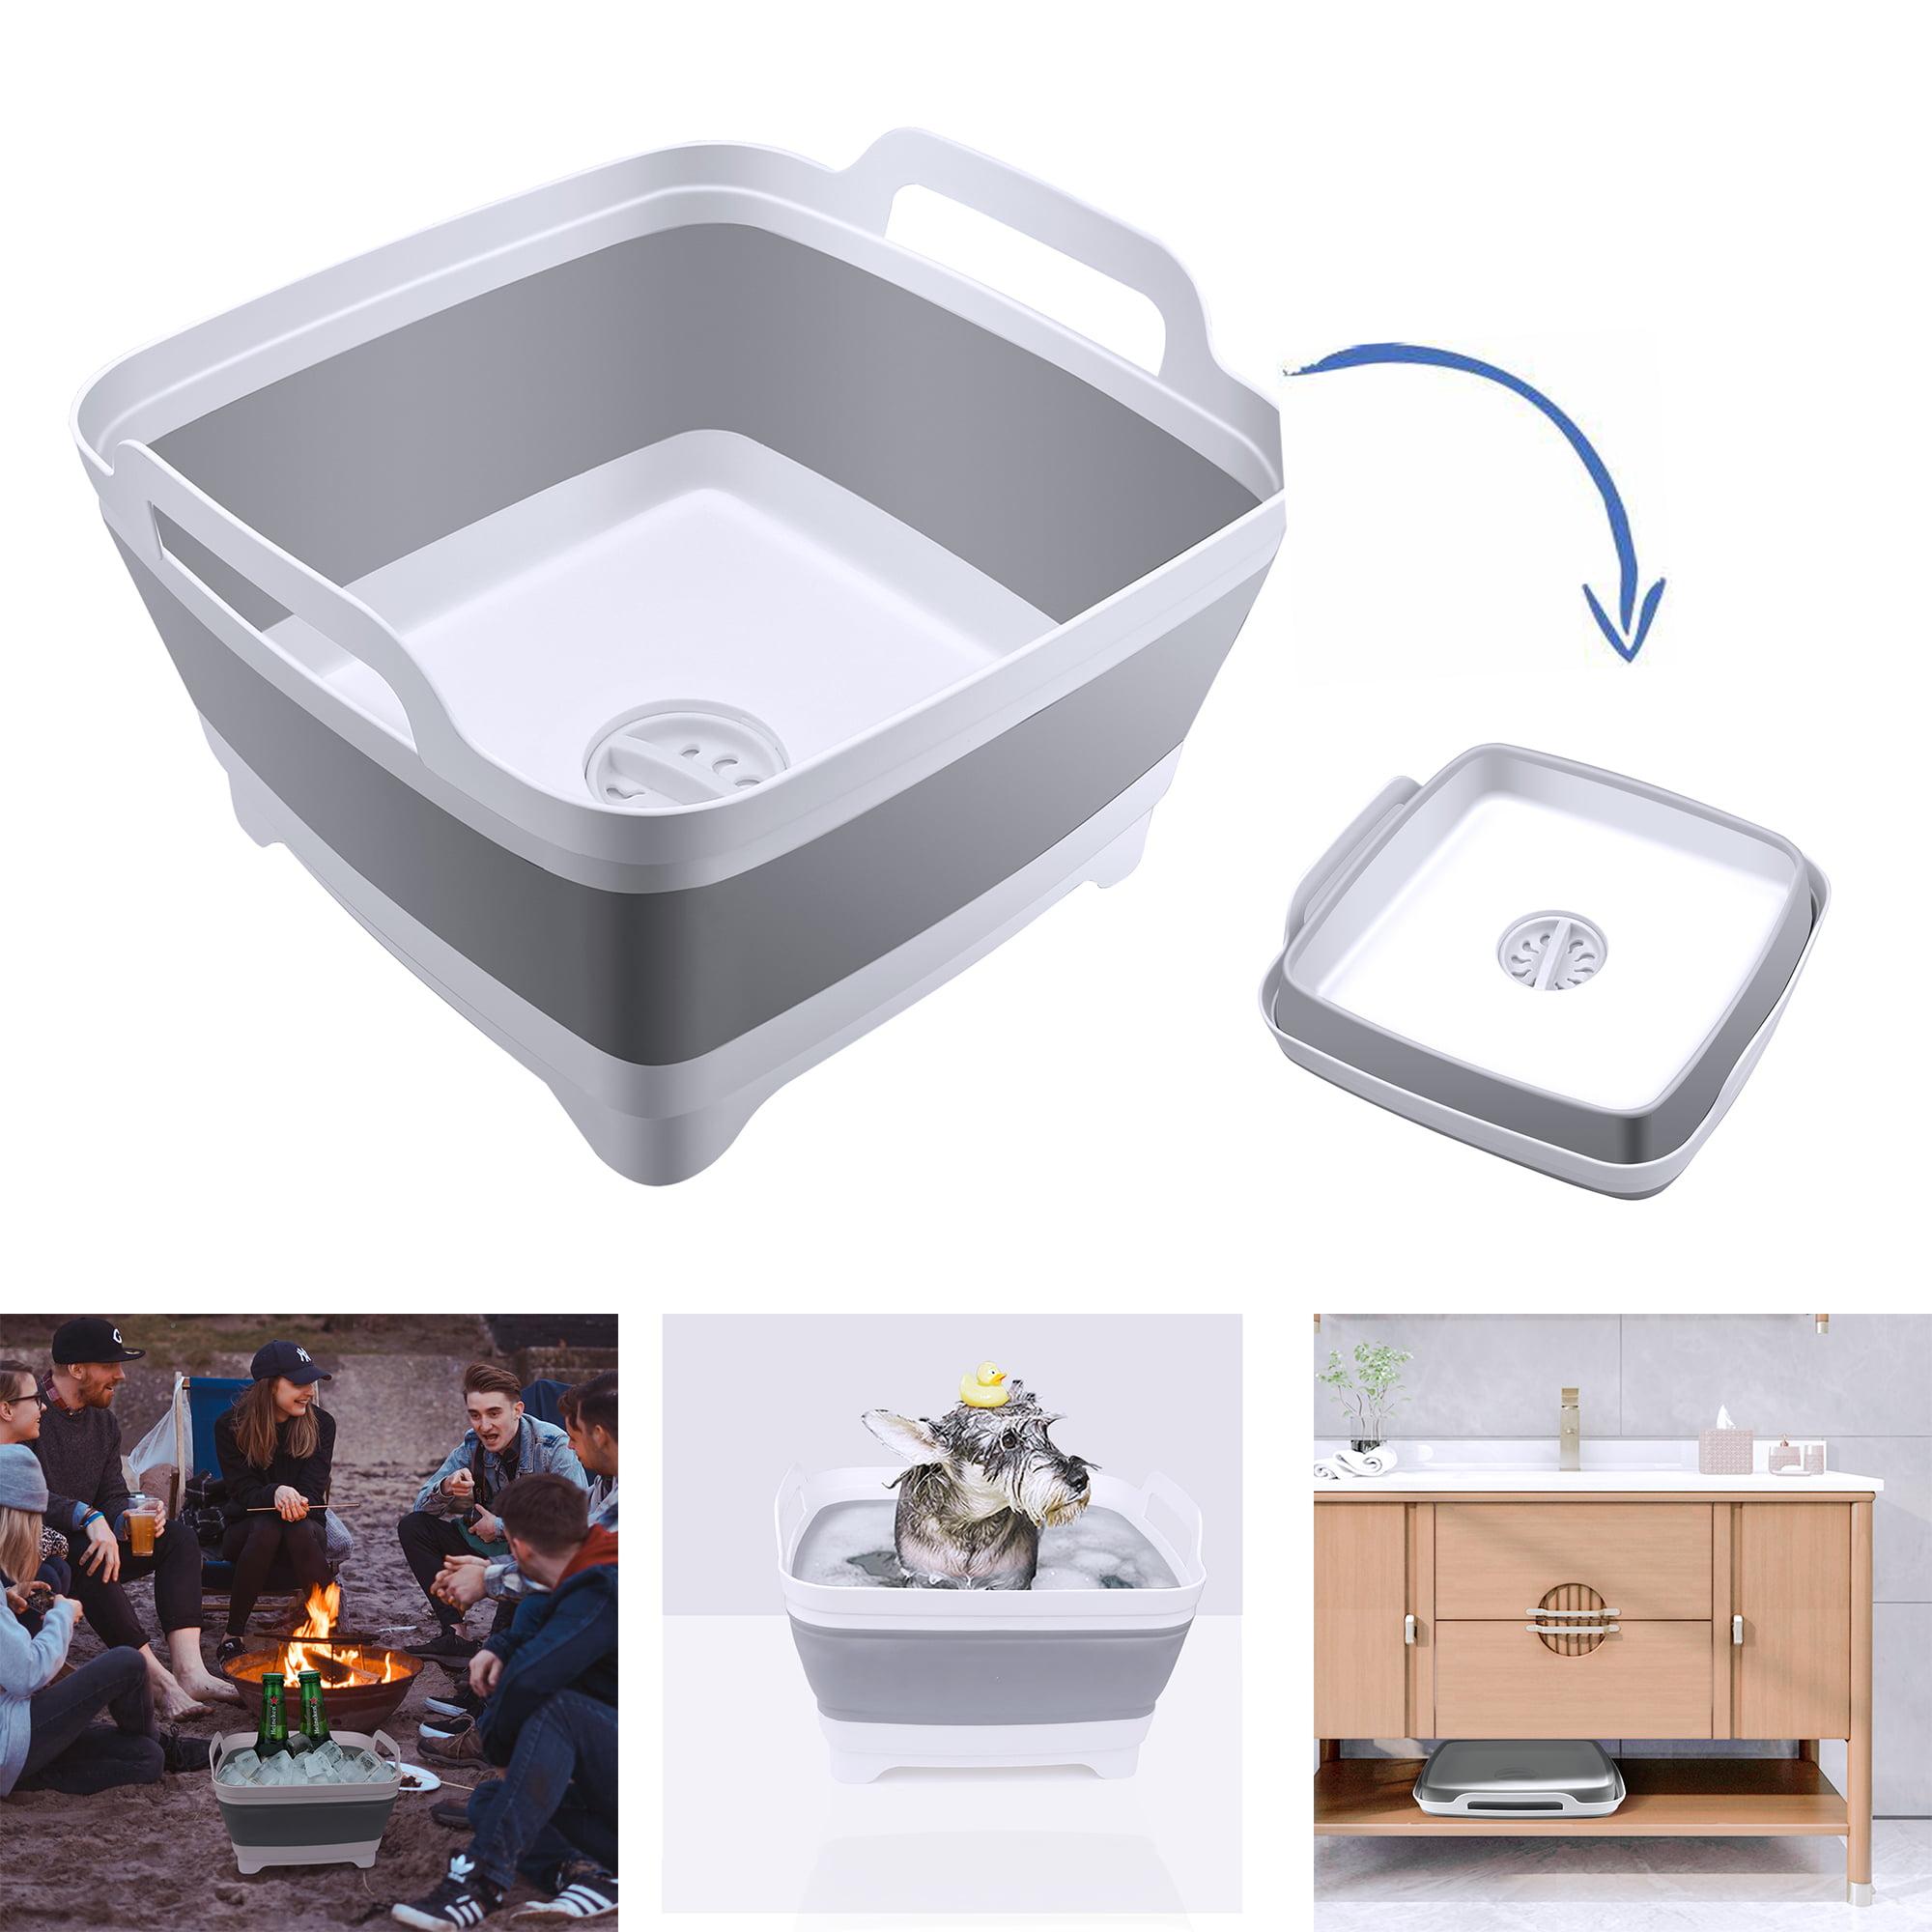 Collapsible Washing Up Bowl Dish Drainer Draining Folding Water Camping Pot